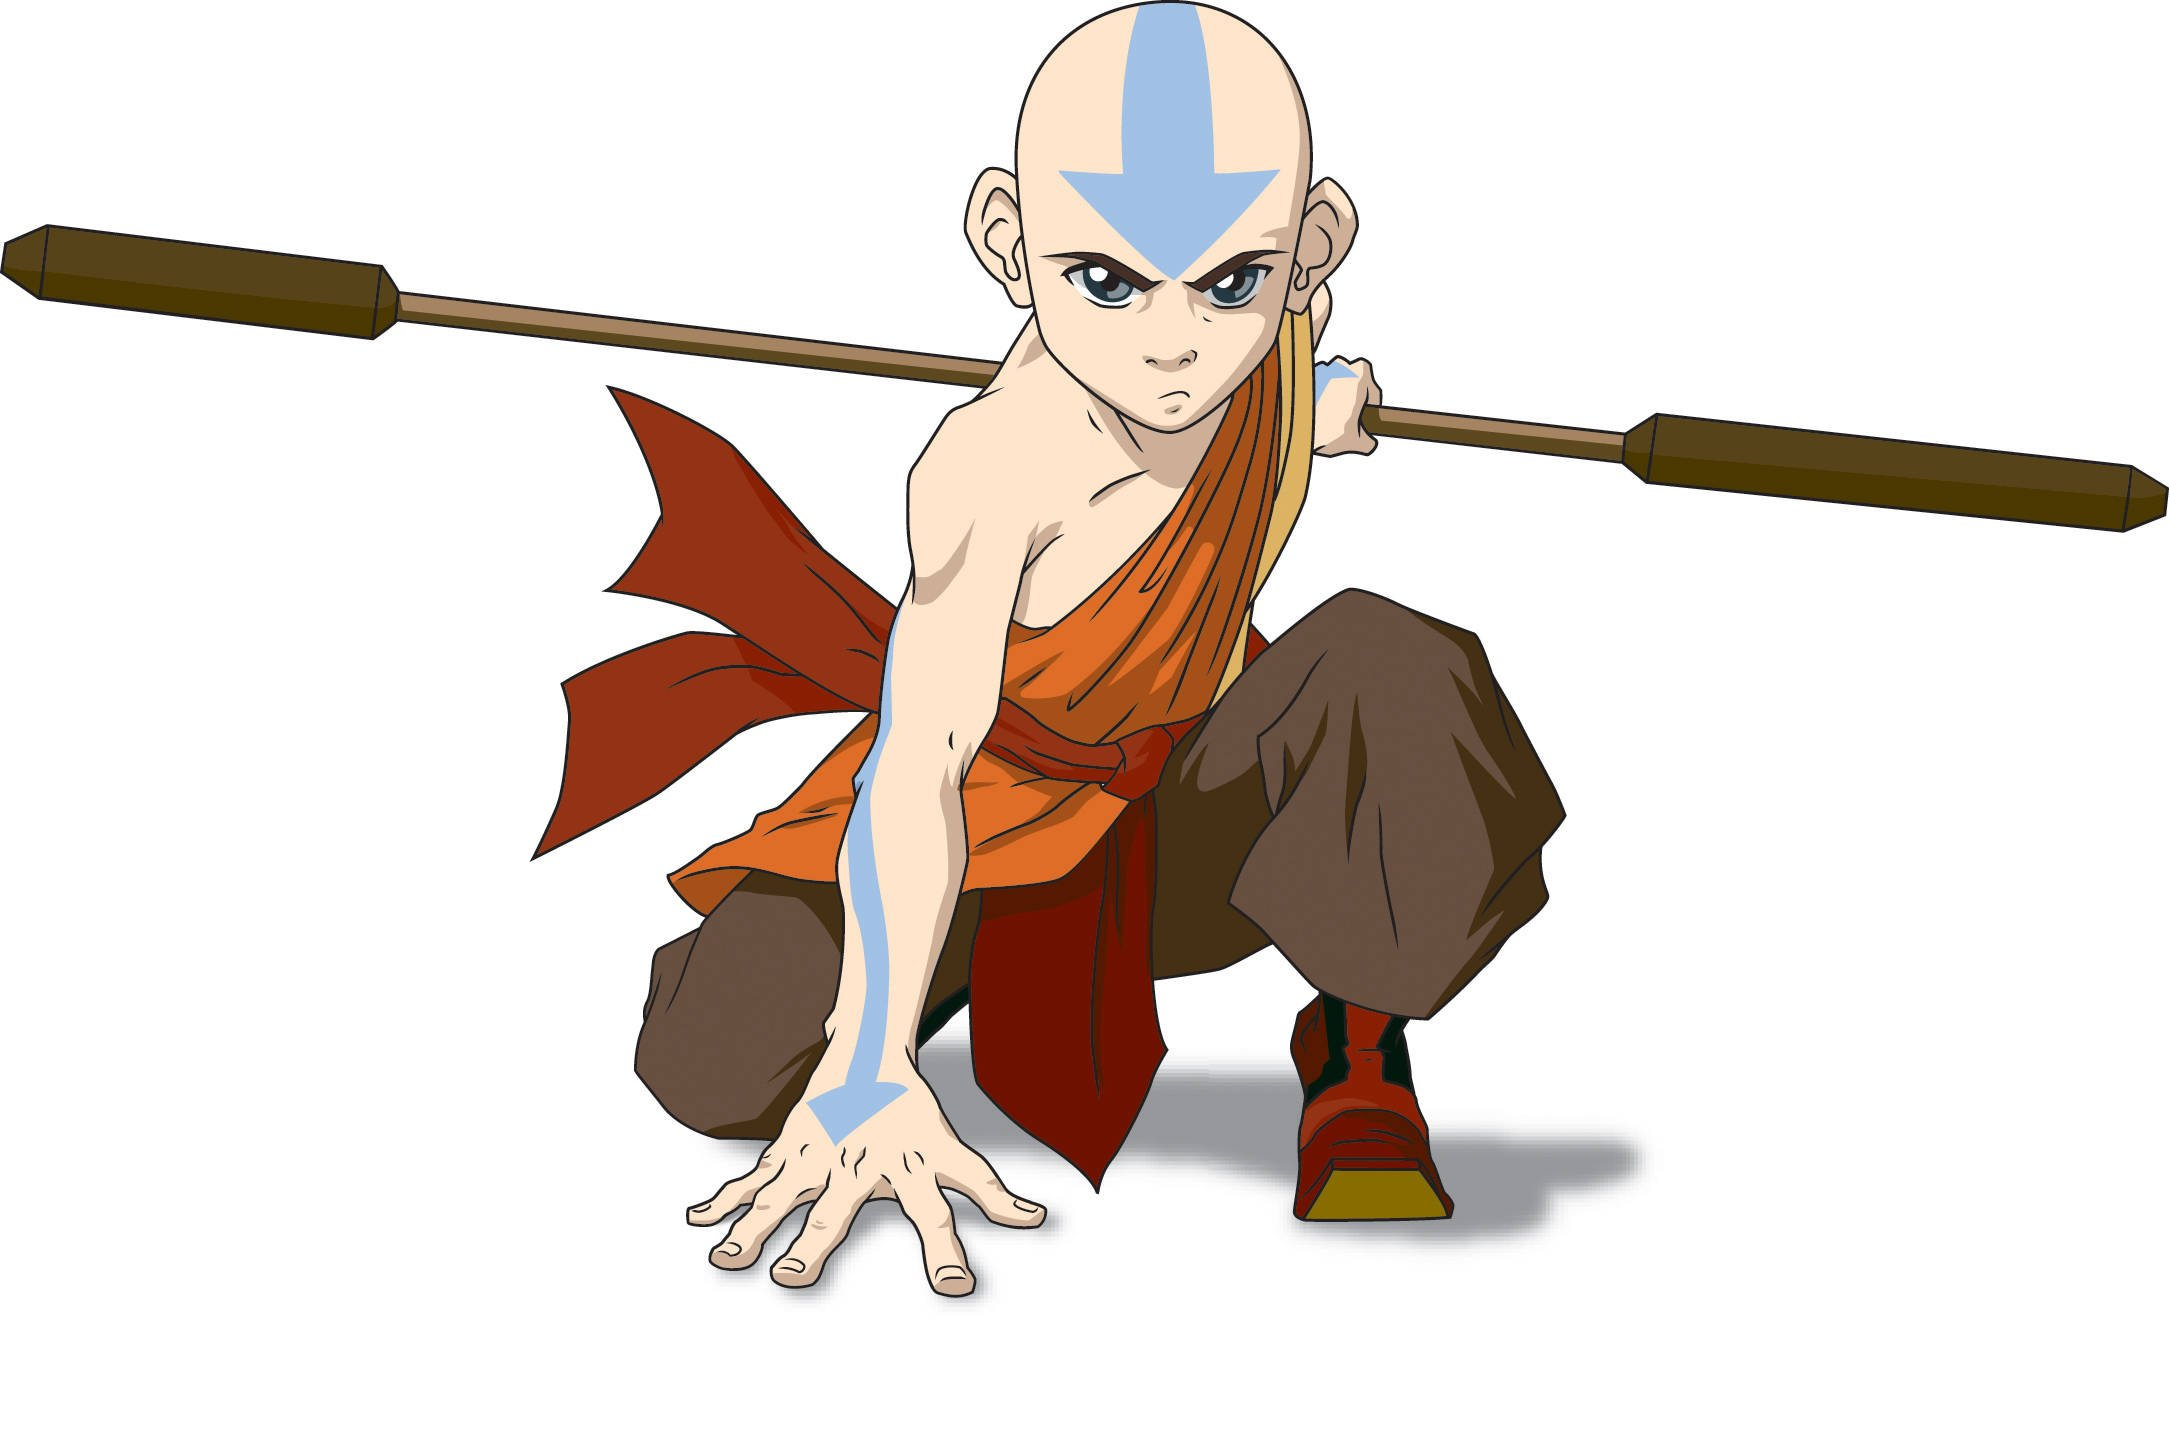 """Avatar: The Last Airbender"" ровно 10 лет с момента выхода на экраны - Изображение 1"